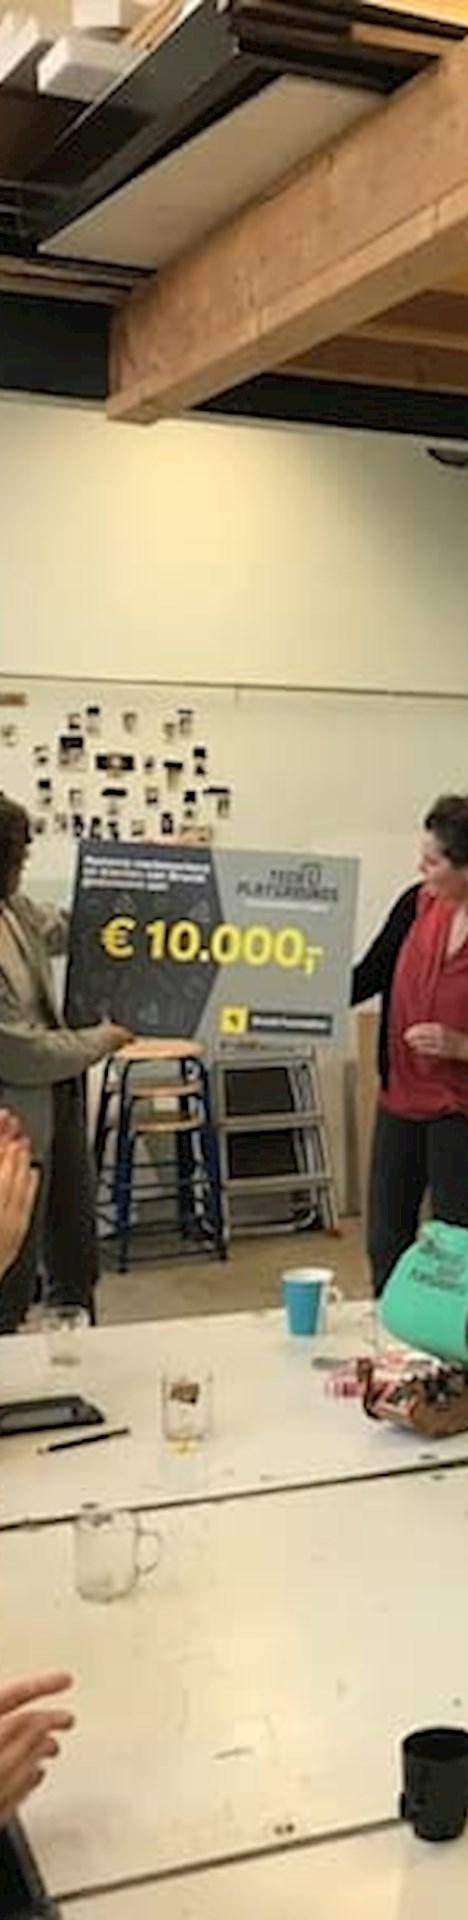 Donation to the Precious Plastic Project